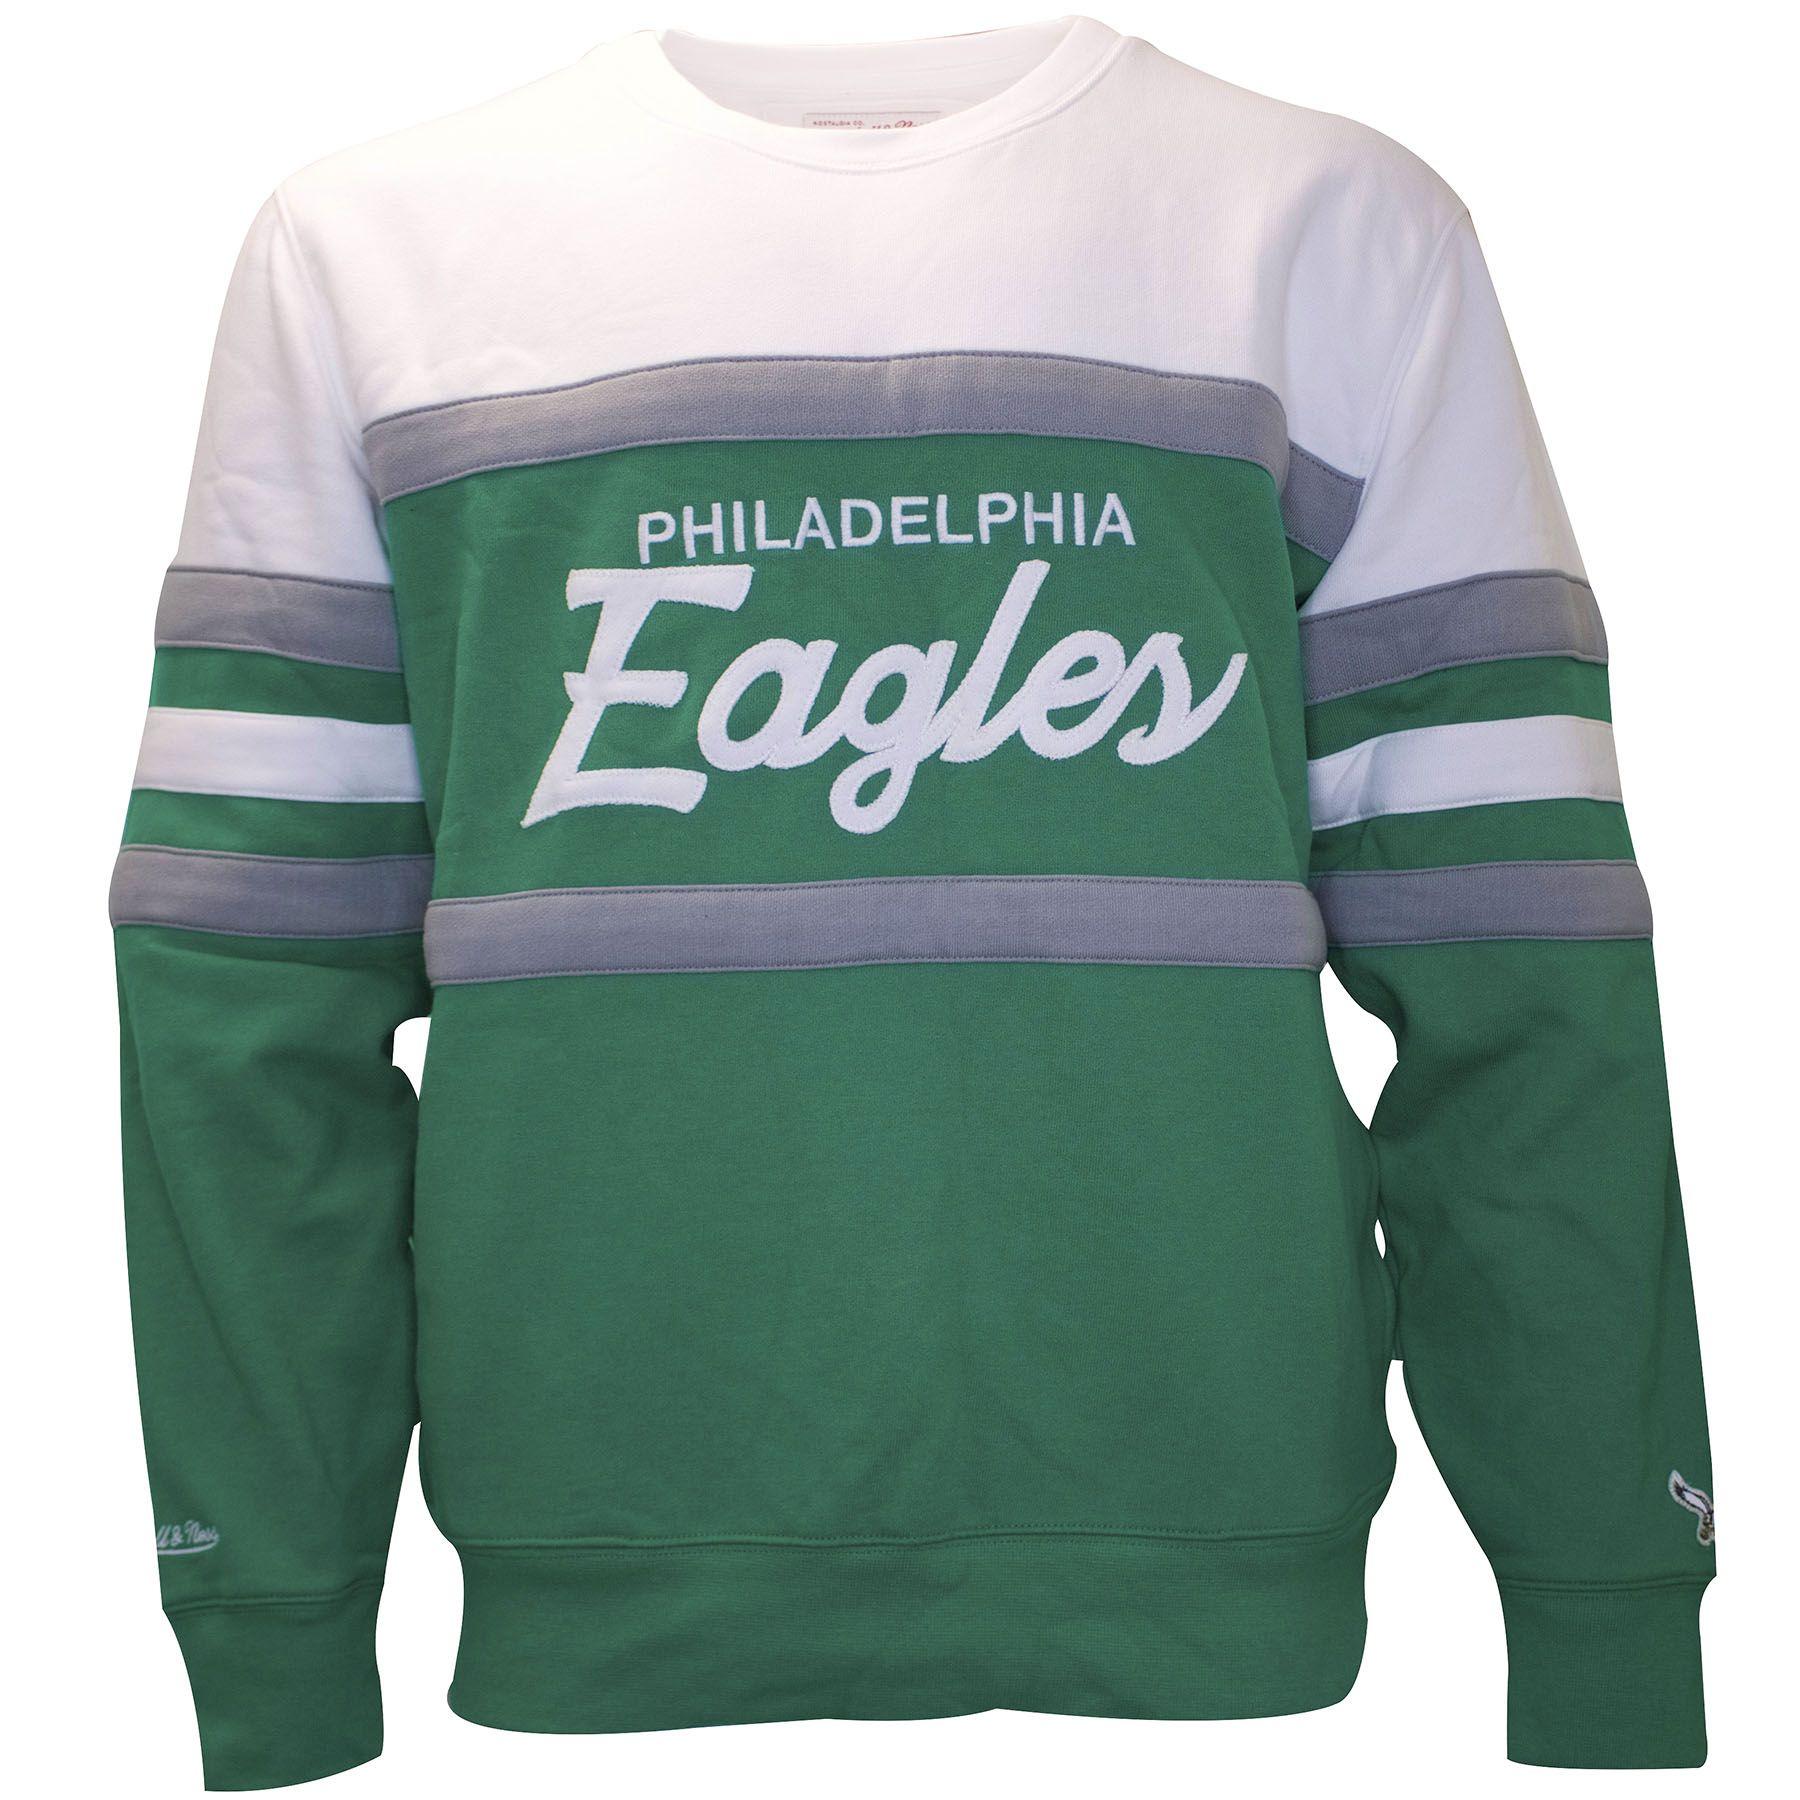 Vintage Philadelphia Eagles Sweater From Mitchell And Ness Now Up Online Go Birds Capswag Com Philadelphia E Philadelphia Eagles Green Crewneck Sweatshirts [ 1800 x 1800 Pixel ]